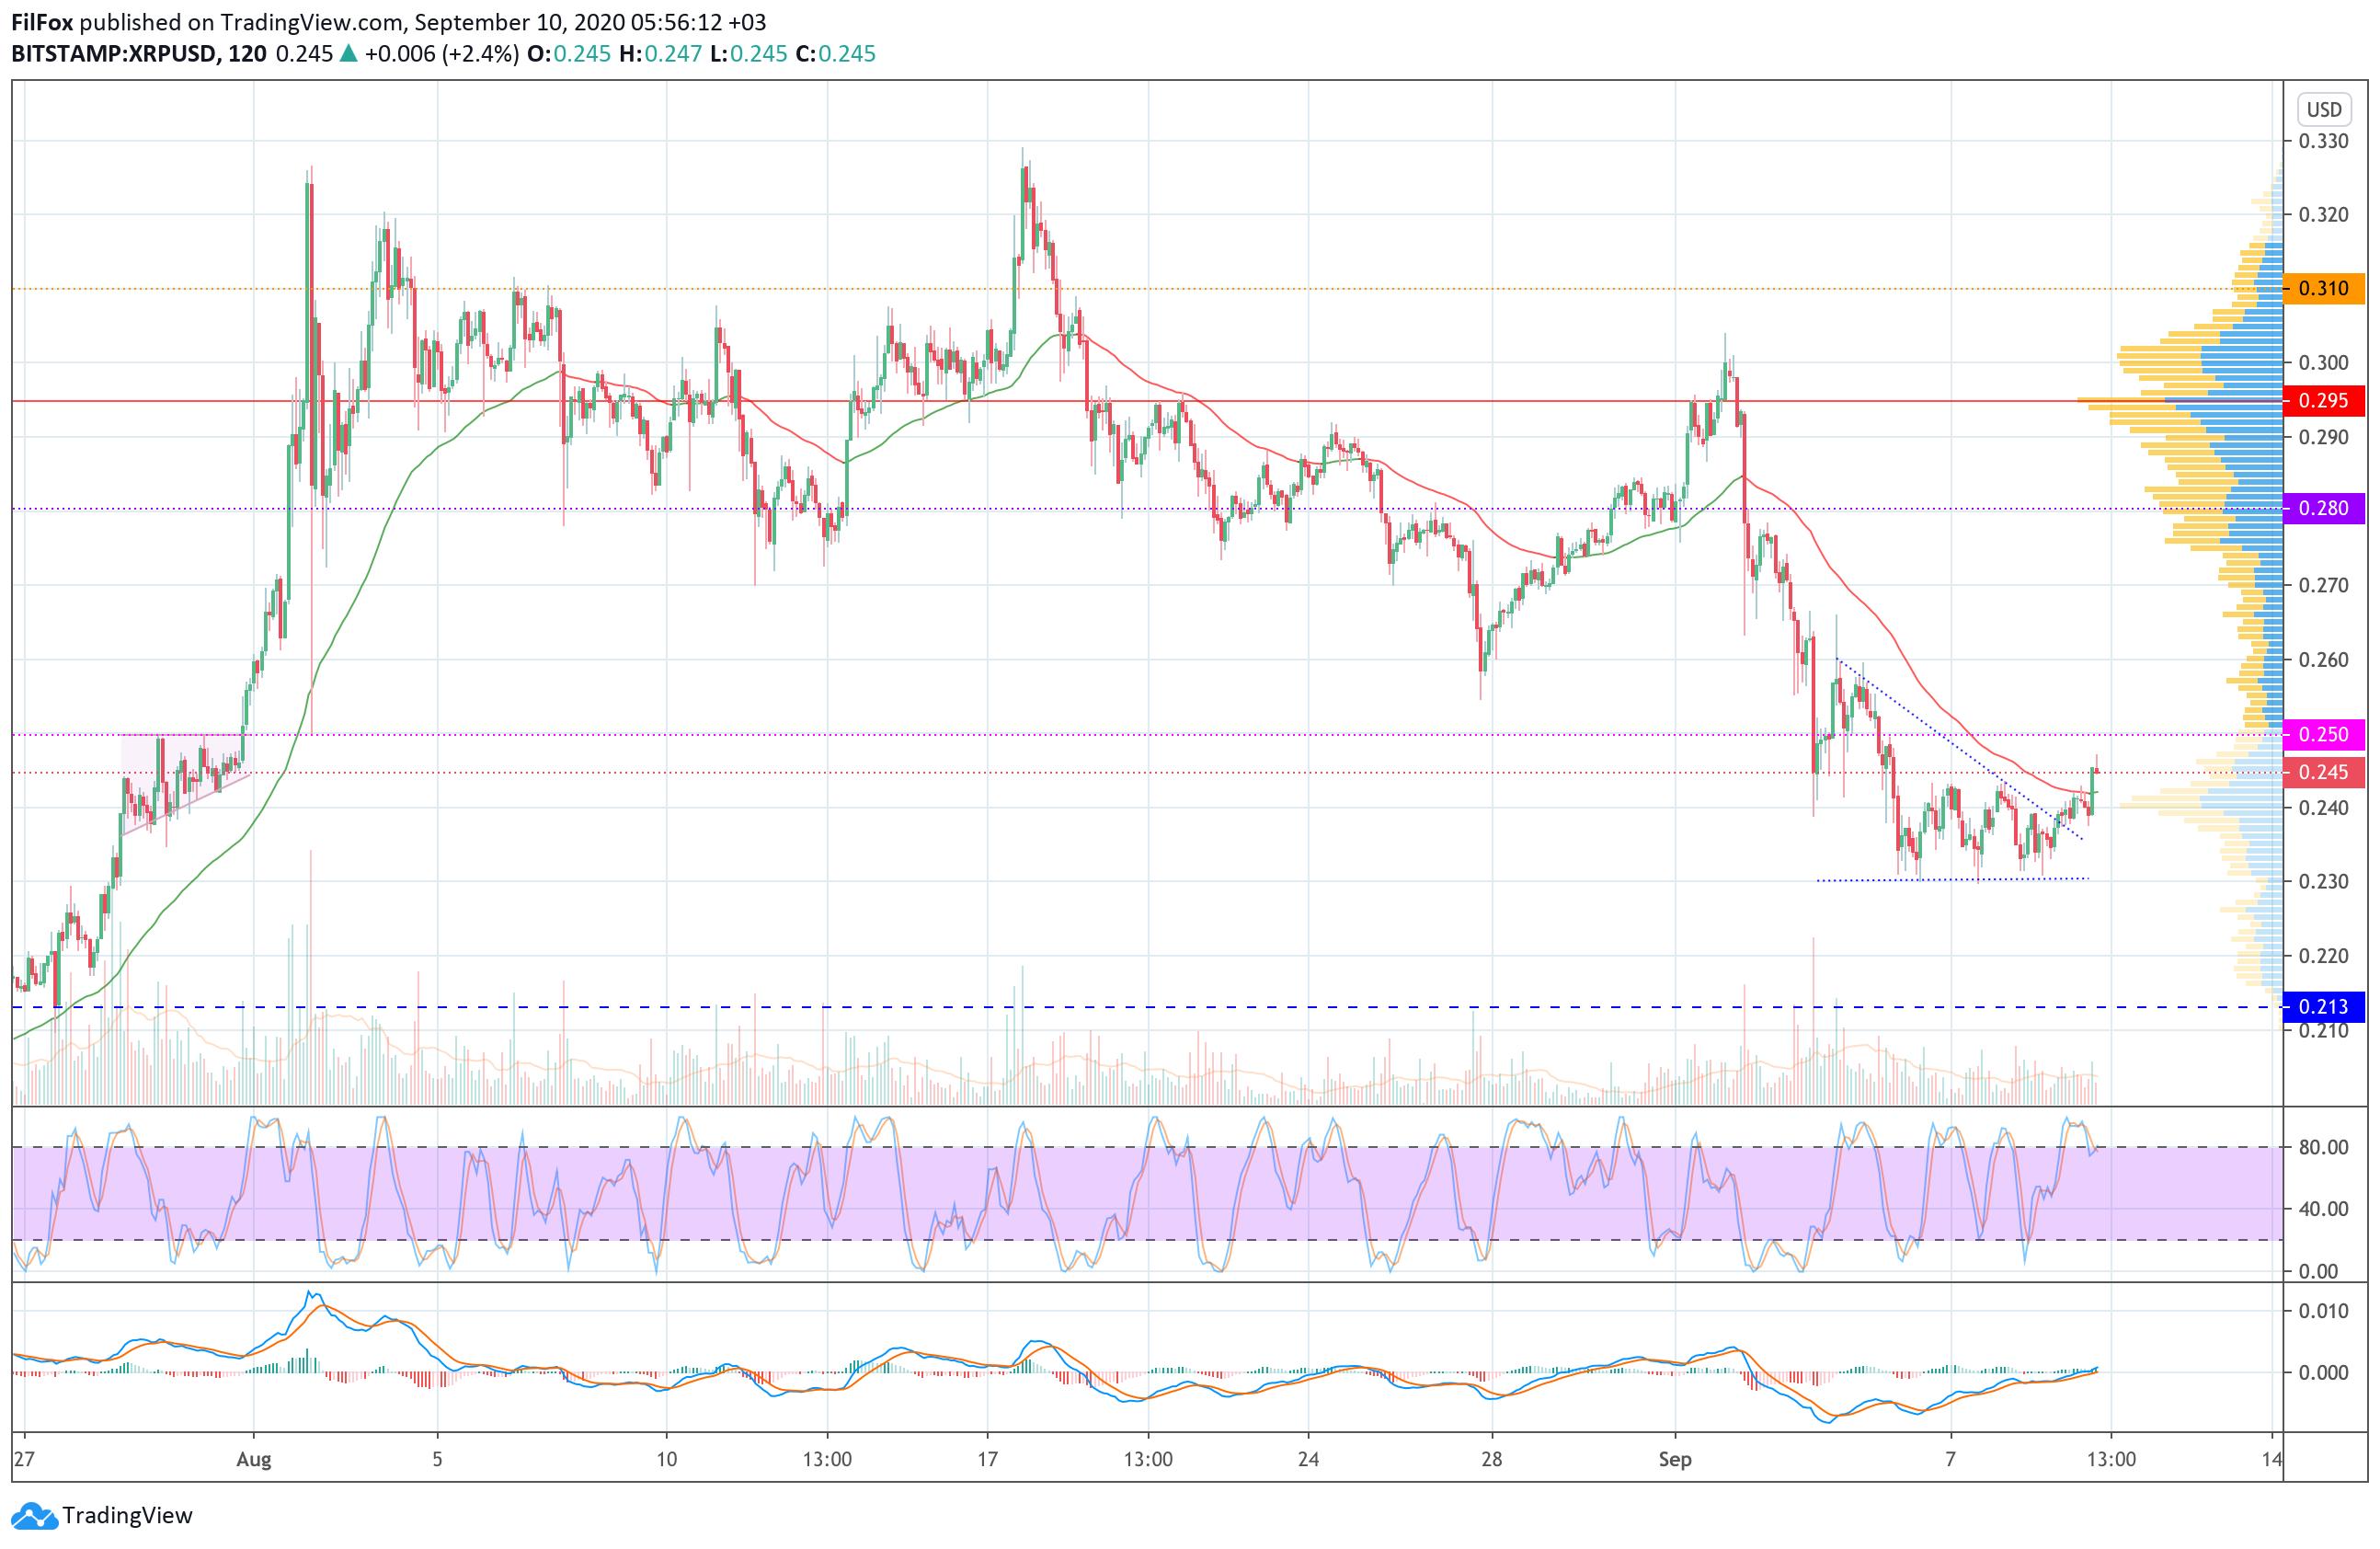 Анализ цен BTC, ETH, XRP (10.09.20)